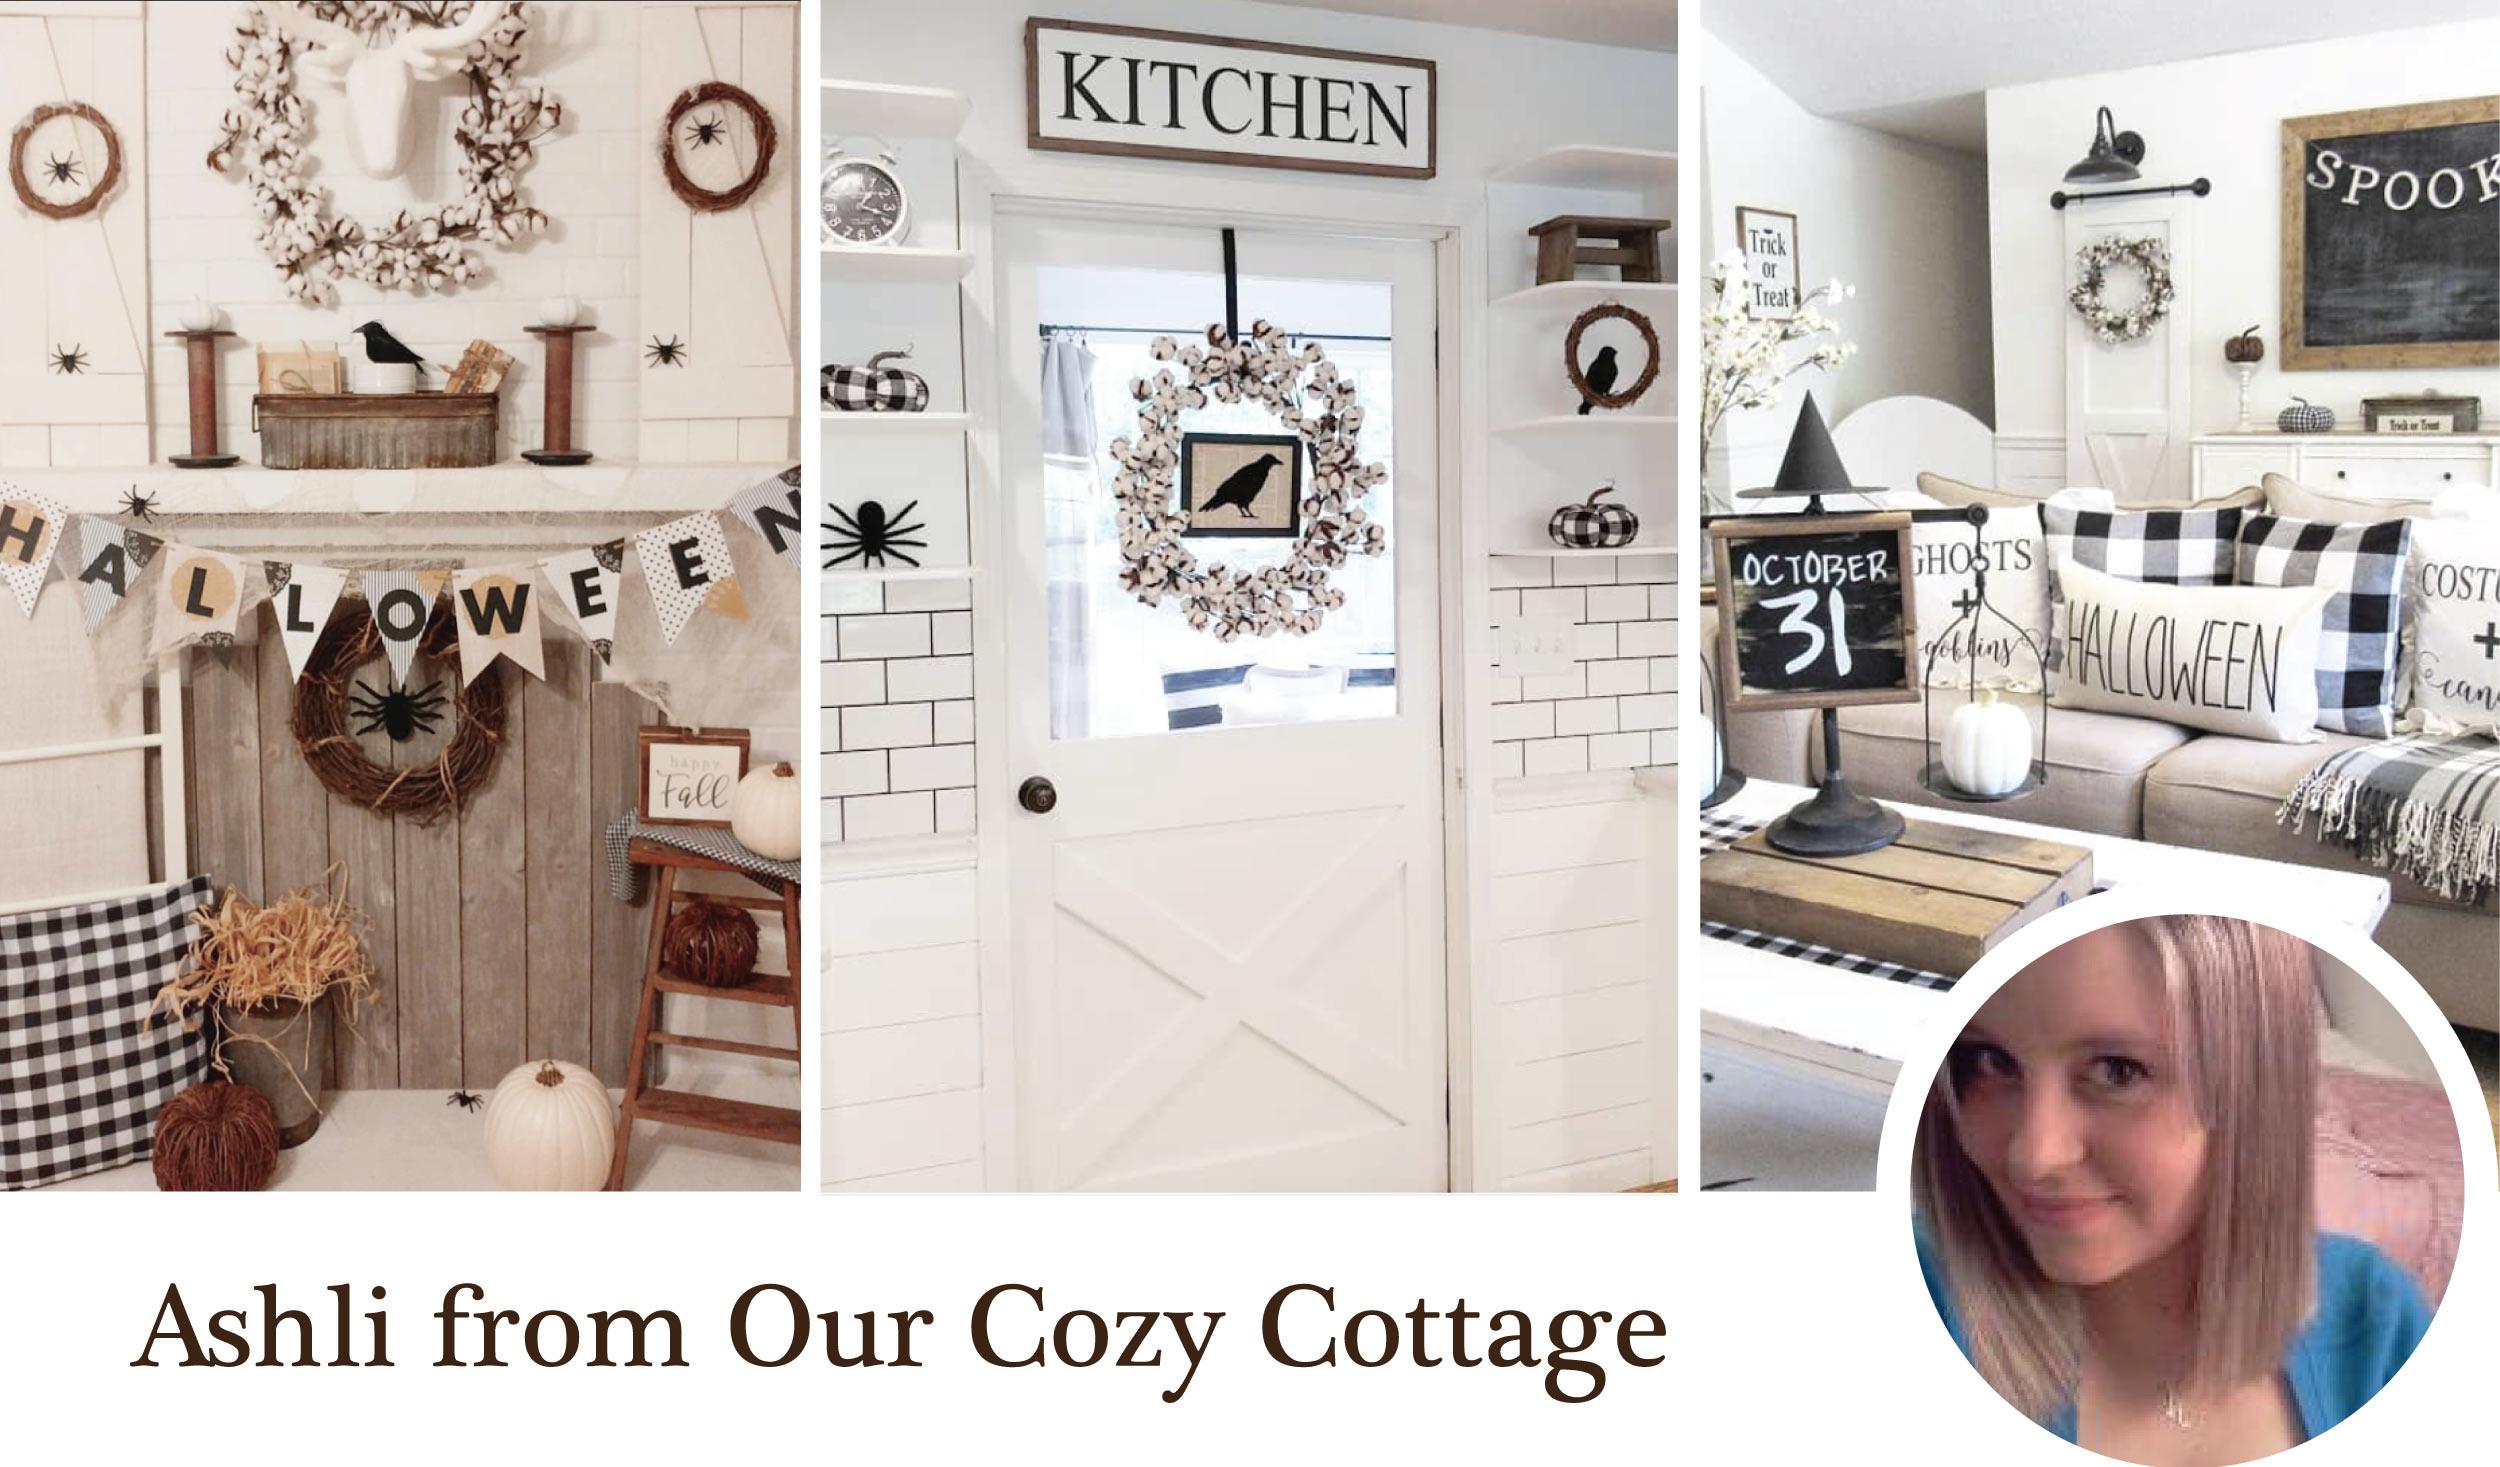 BWL-header-our-cozy-cottage.jpg